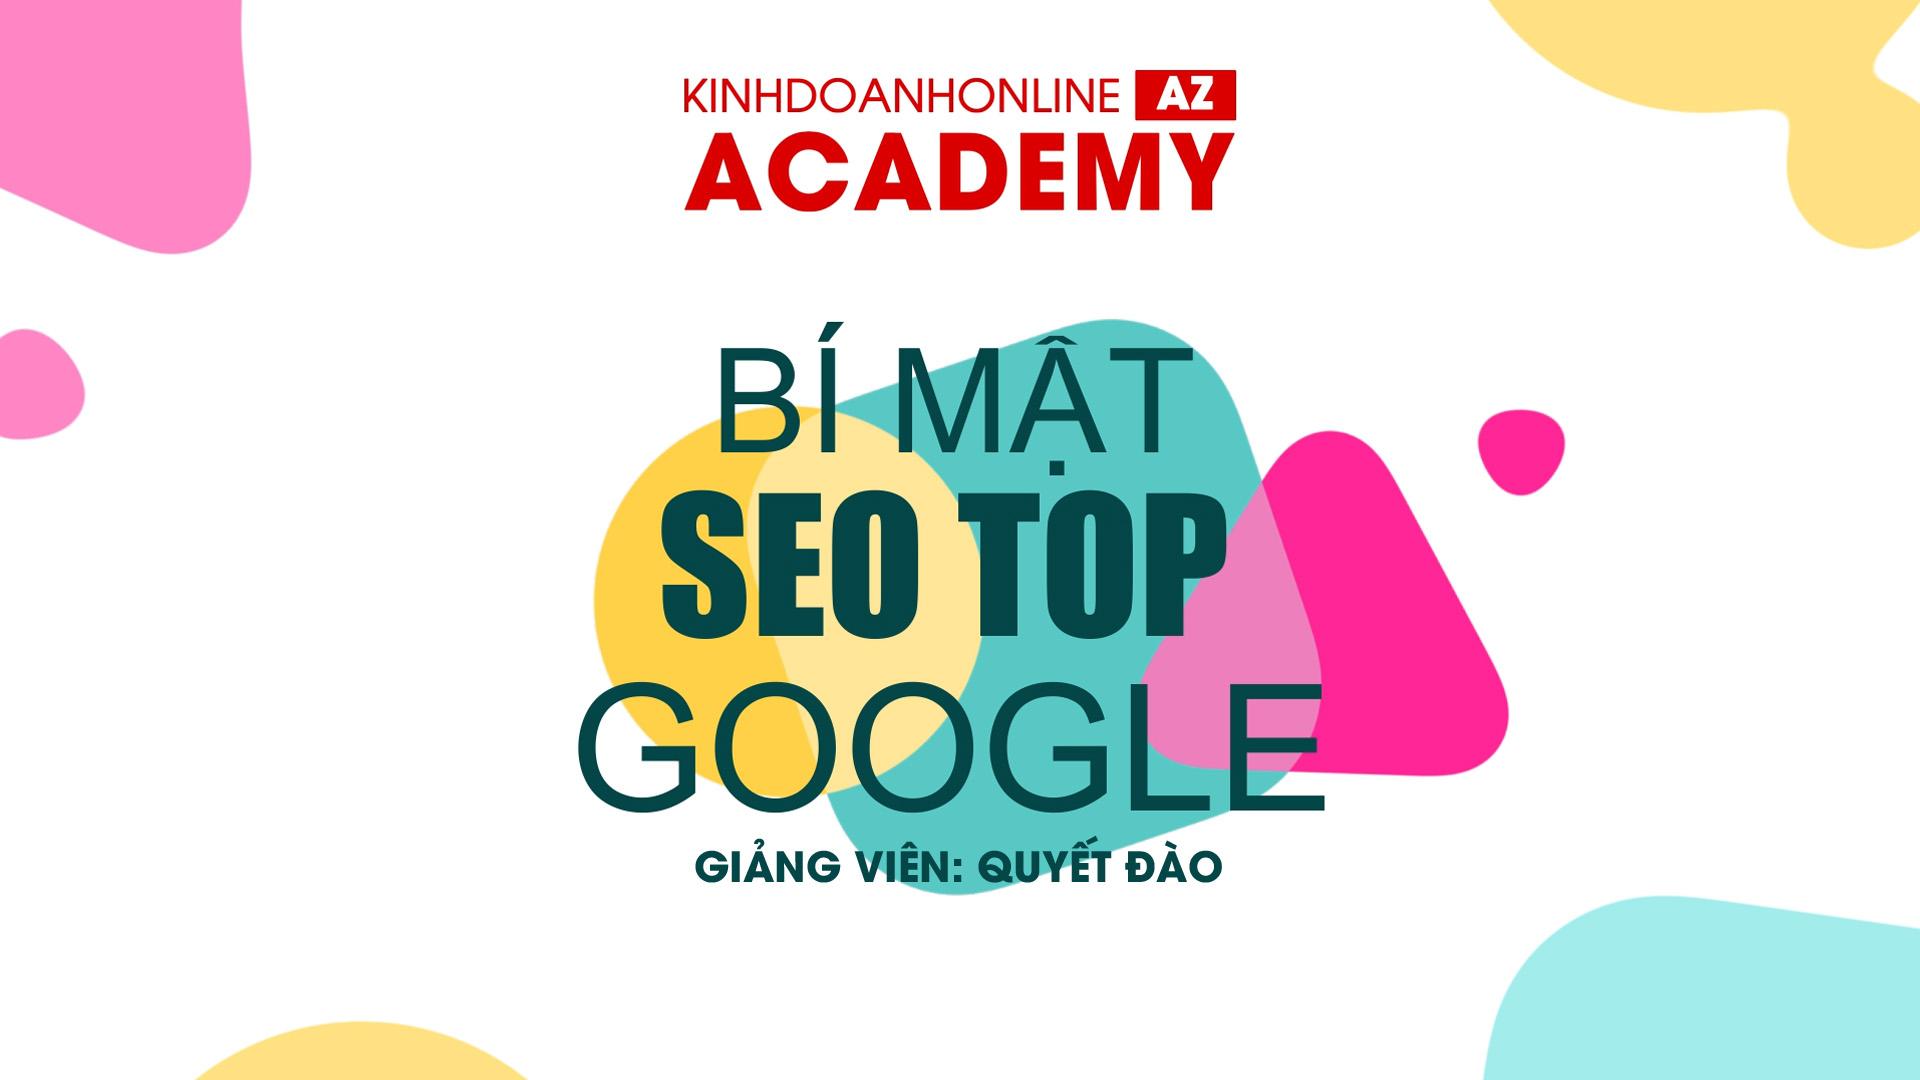 bi-mat-seo-top-google-quyet-dao-kinh-doanh-online-az